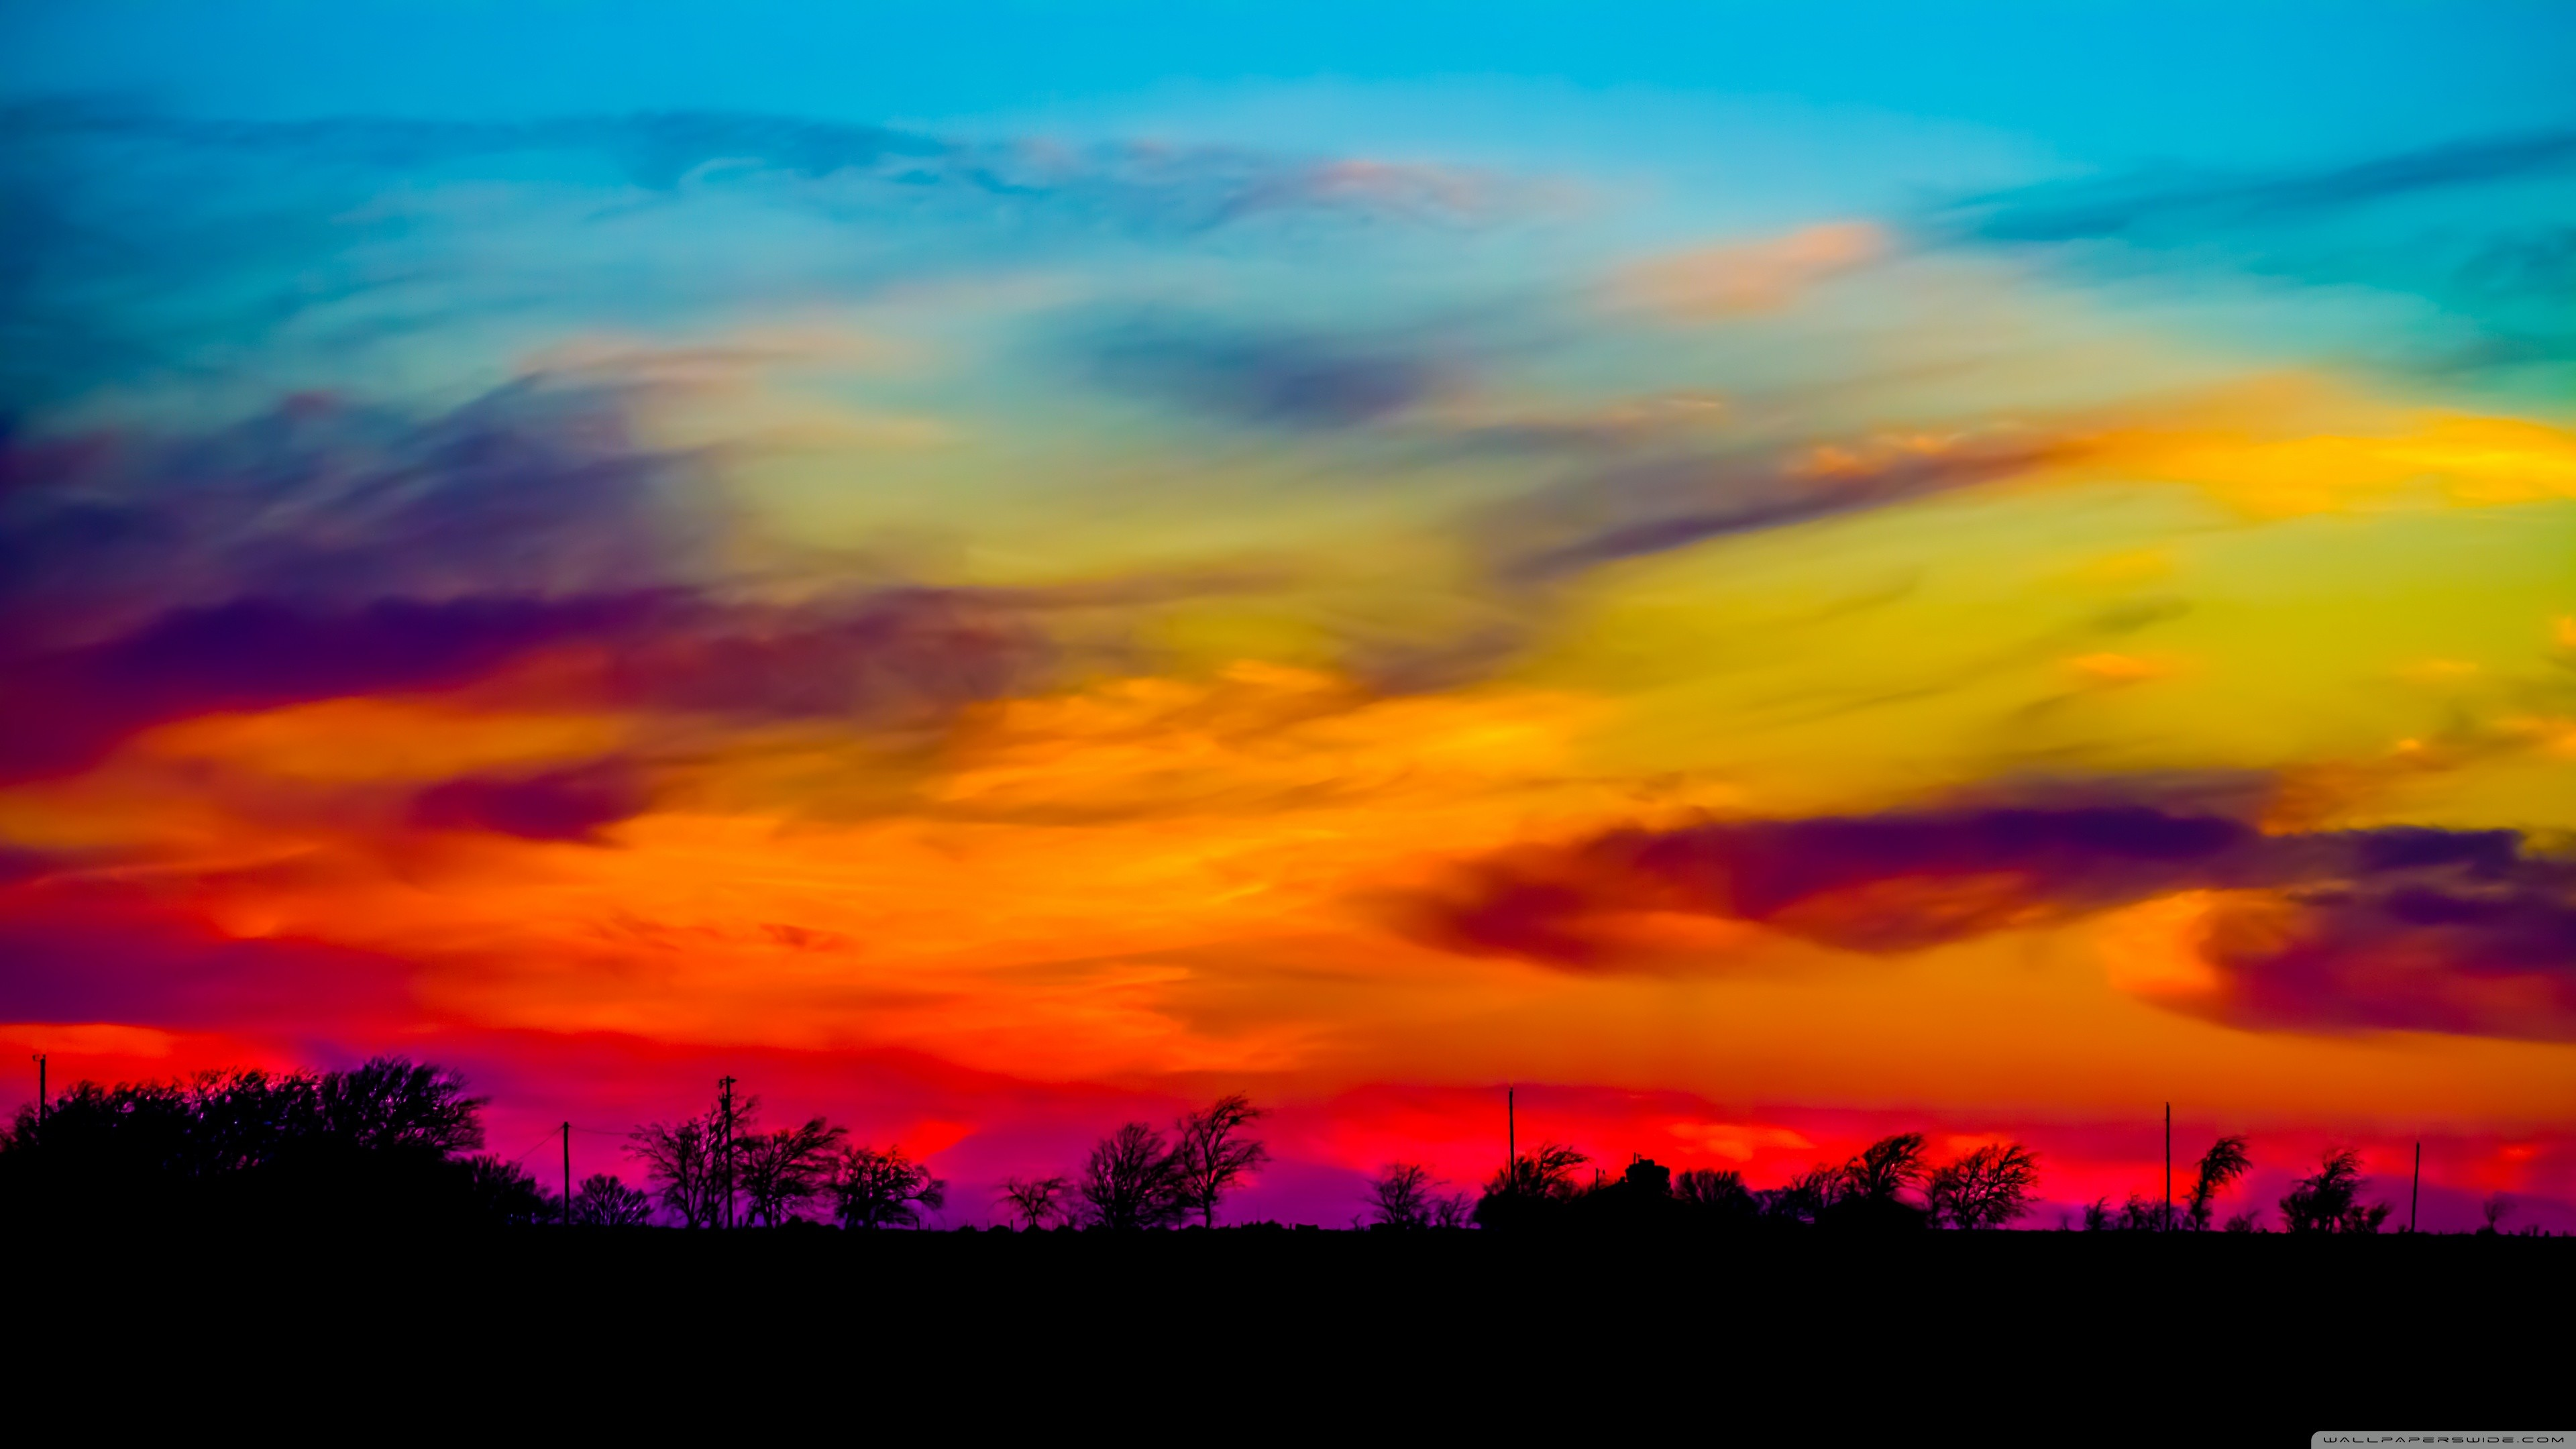 Uhd - High Resolution Colorful Sky - HD Wallpaper